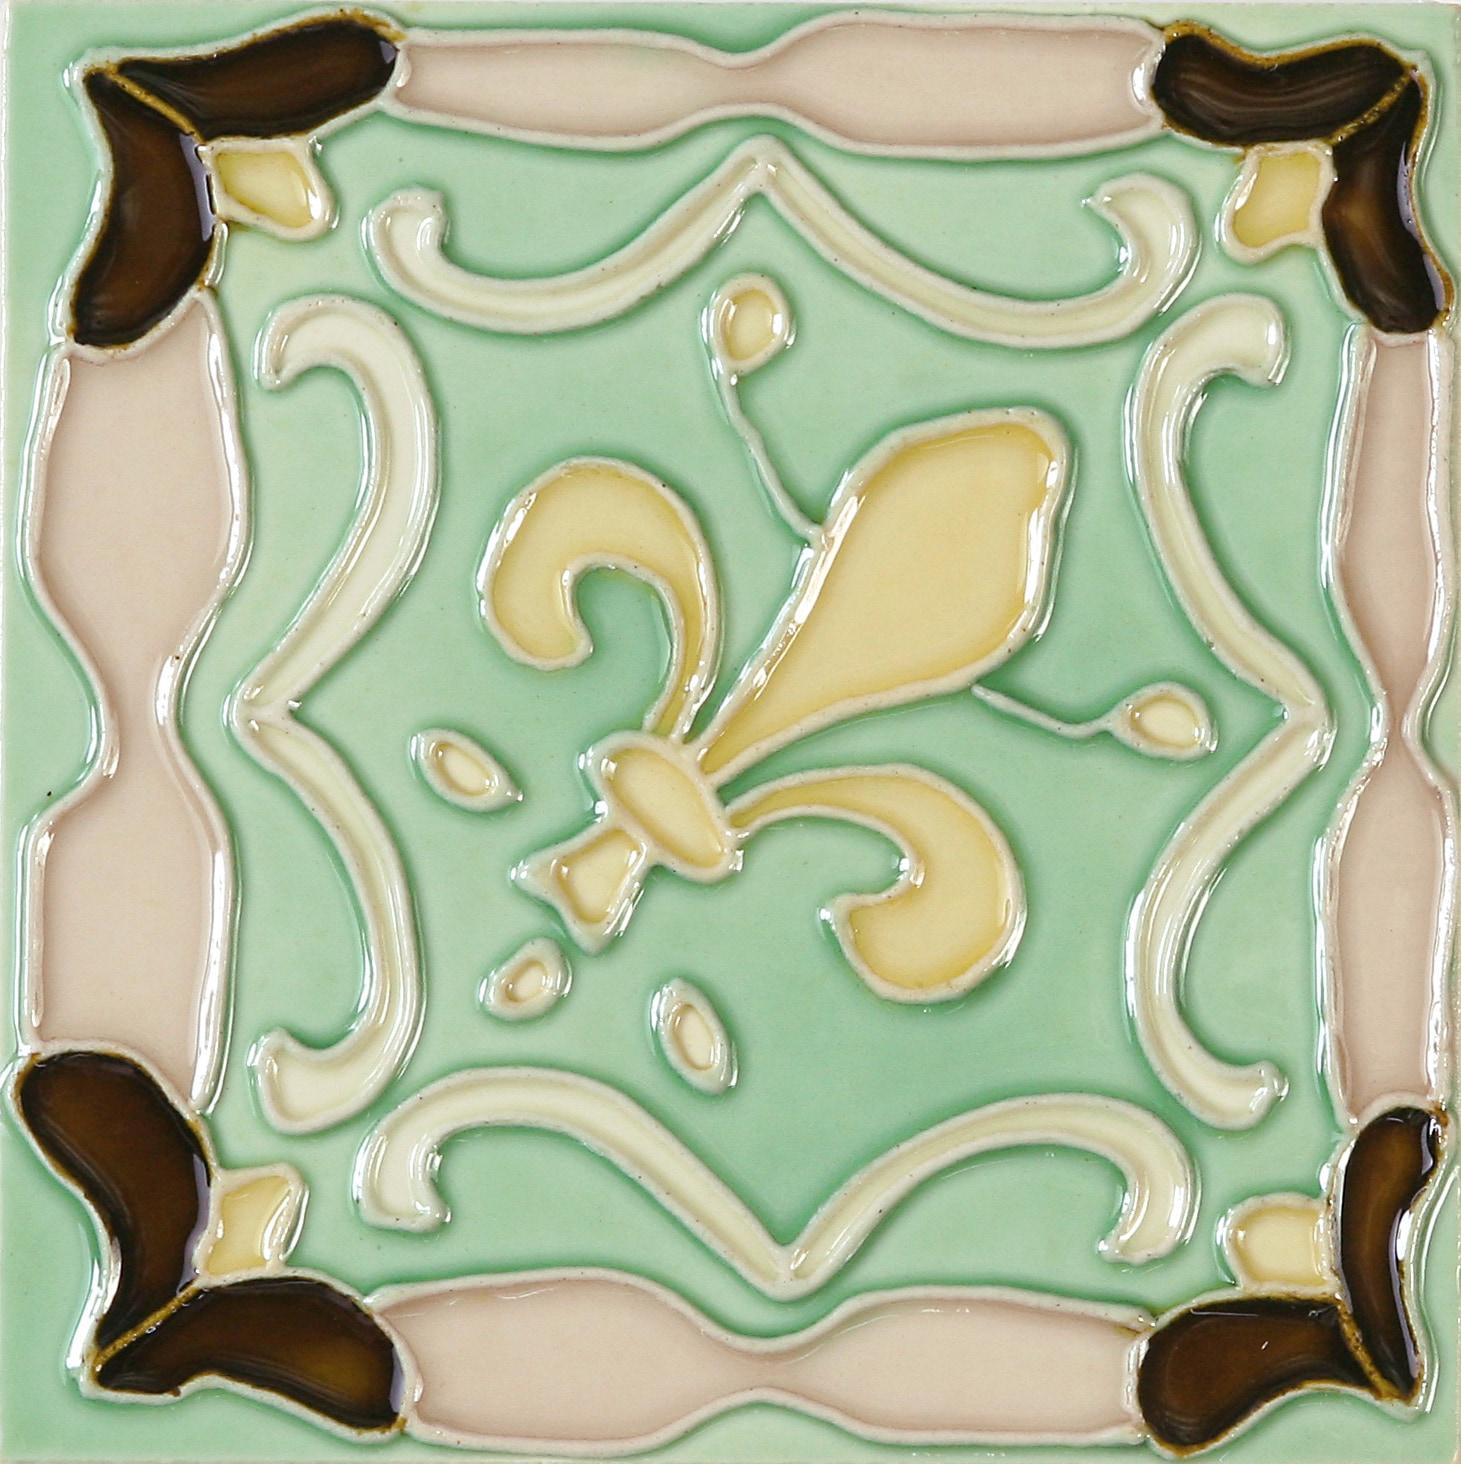 Hand-Painted Ceramic Glazed Wall Tile in Fleur De Lis Hand-Painted Ceramic Glazed Wall Tile in Fleur De Lis 0